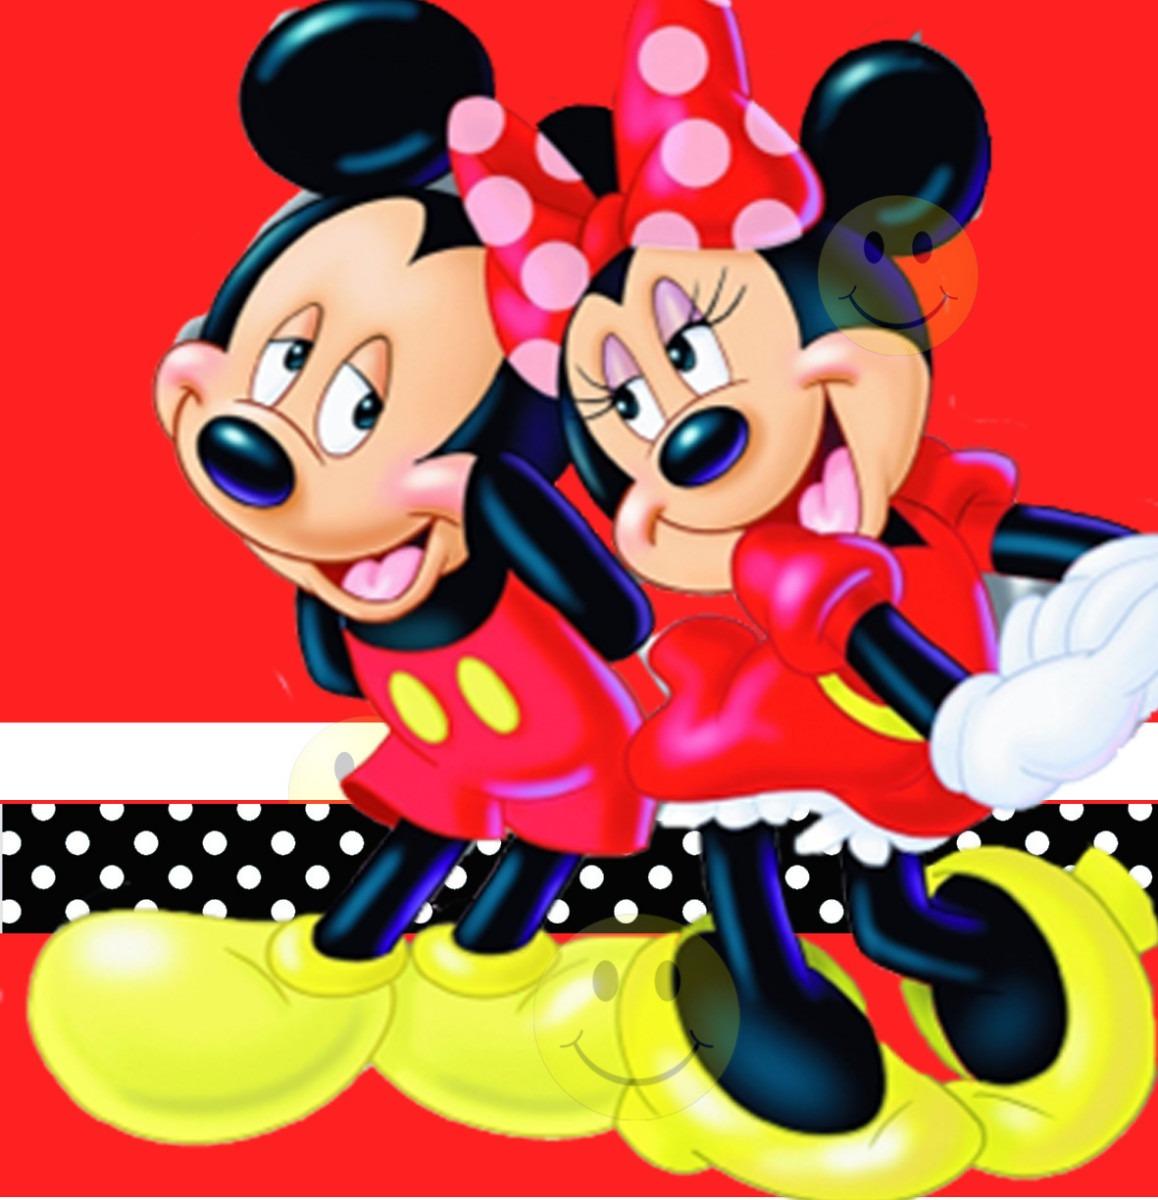 Bellos momentos minnie y mickey - Minni et mickey ...